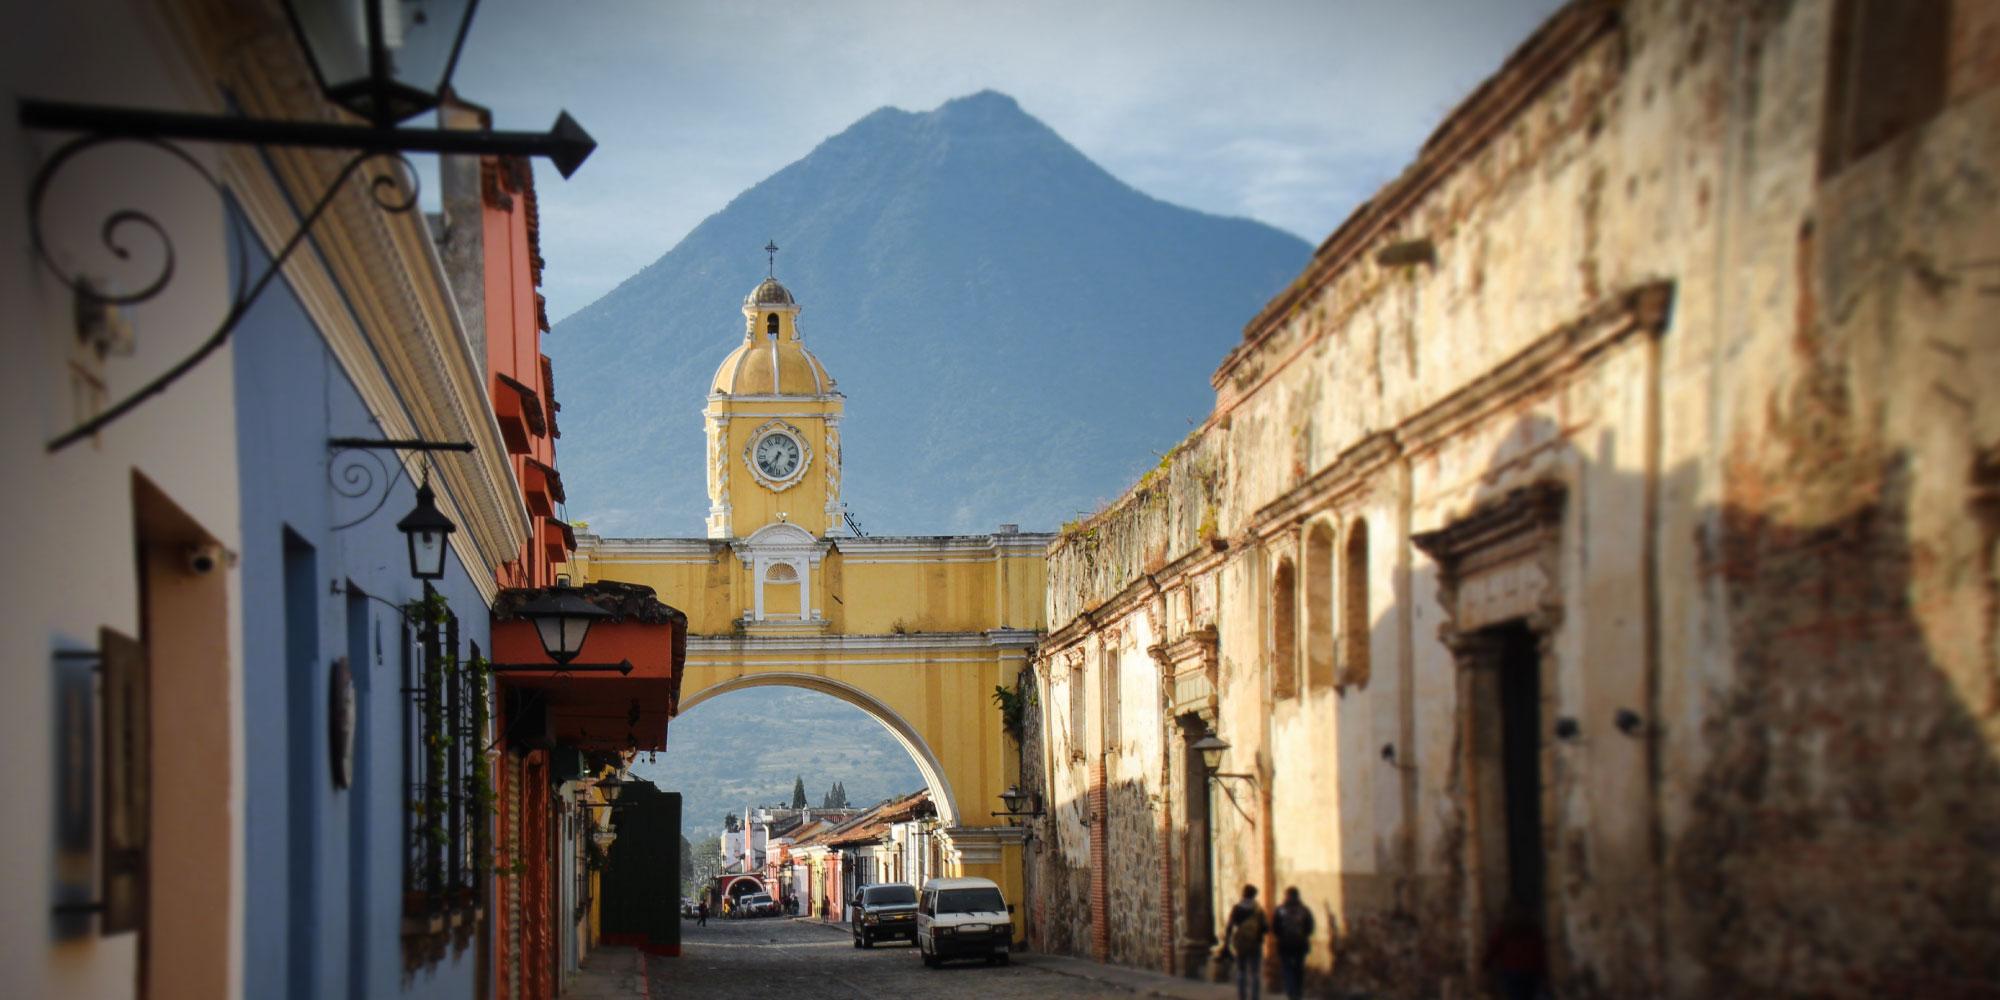 guatemala-banner-image.jpg